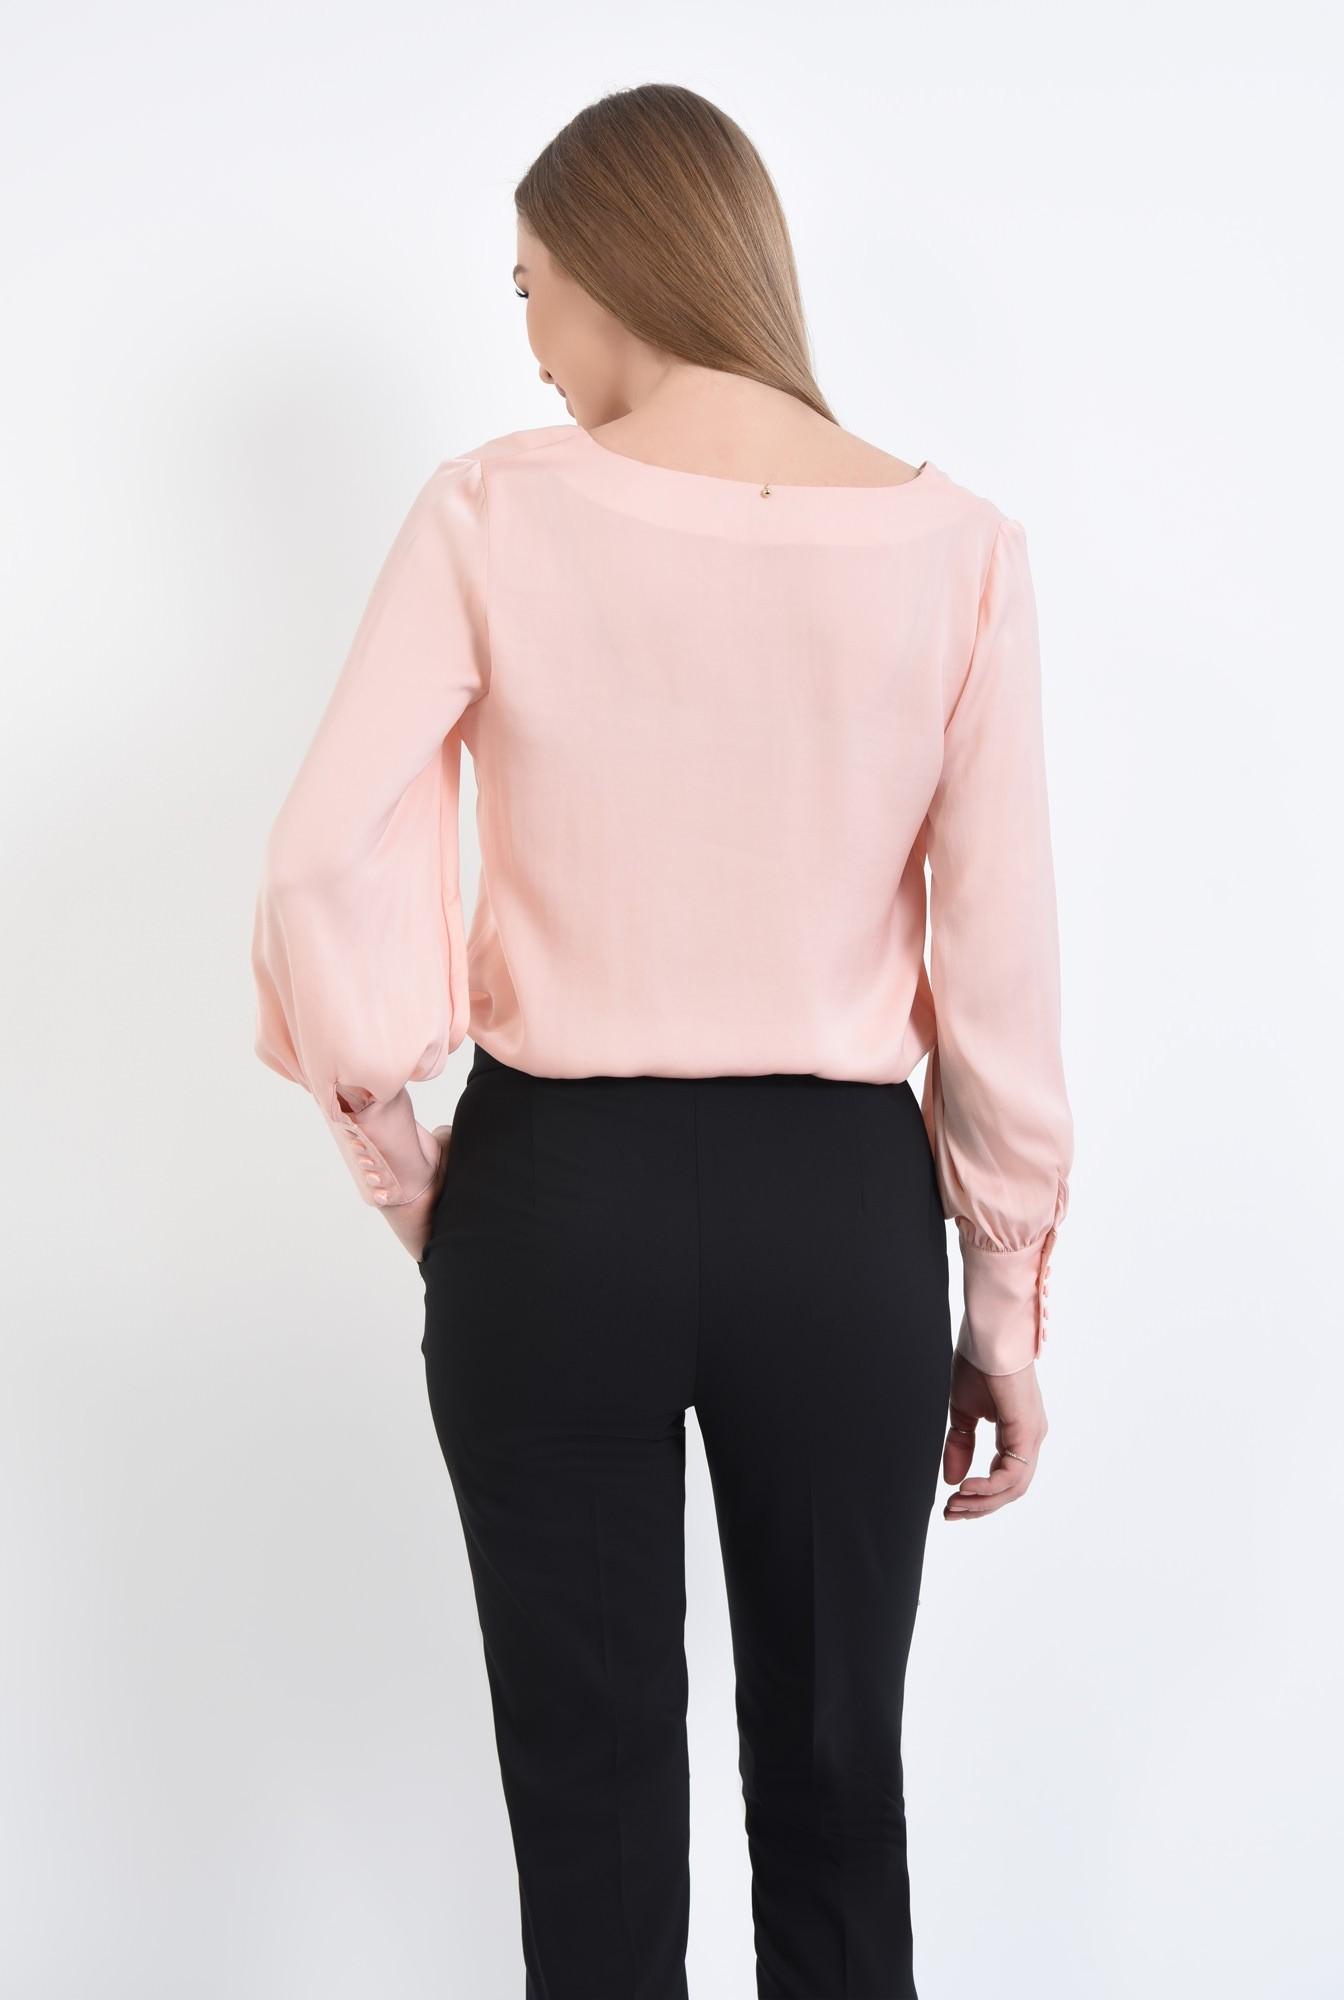 1 - 360 - Bluza roz, croi lejer, maneci bufante lungi, manseta inalta, decolteu in V